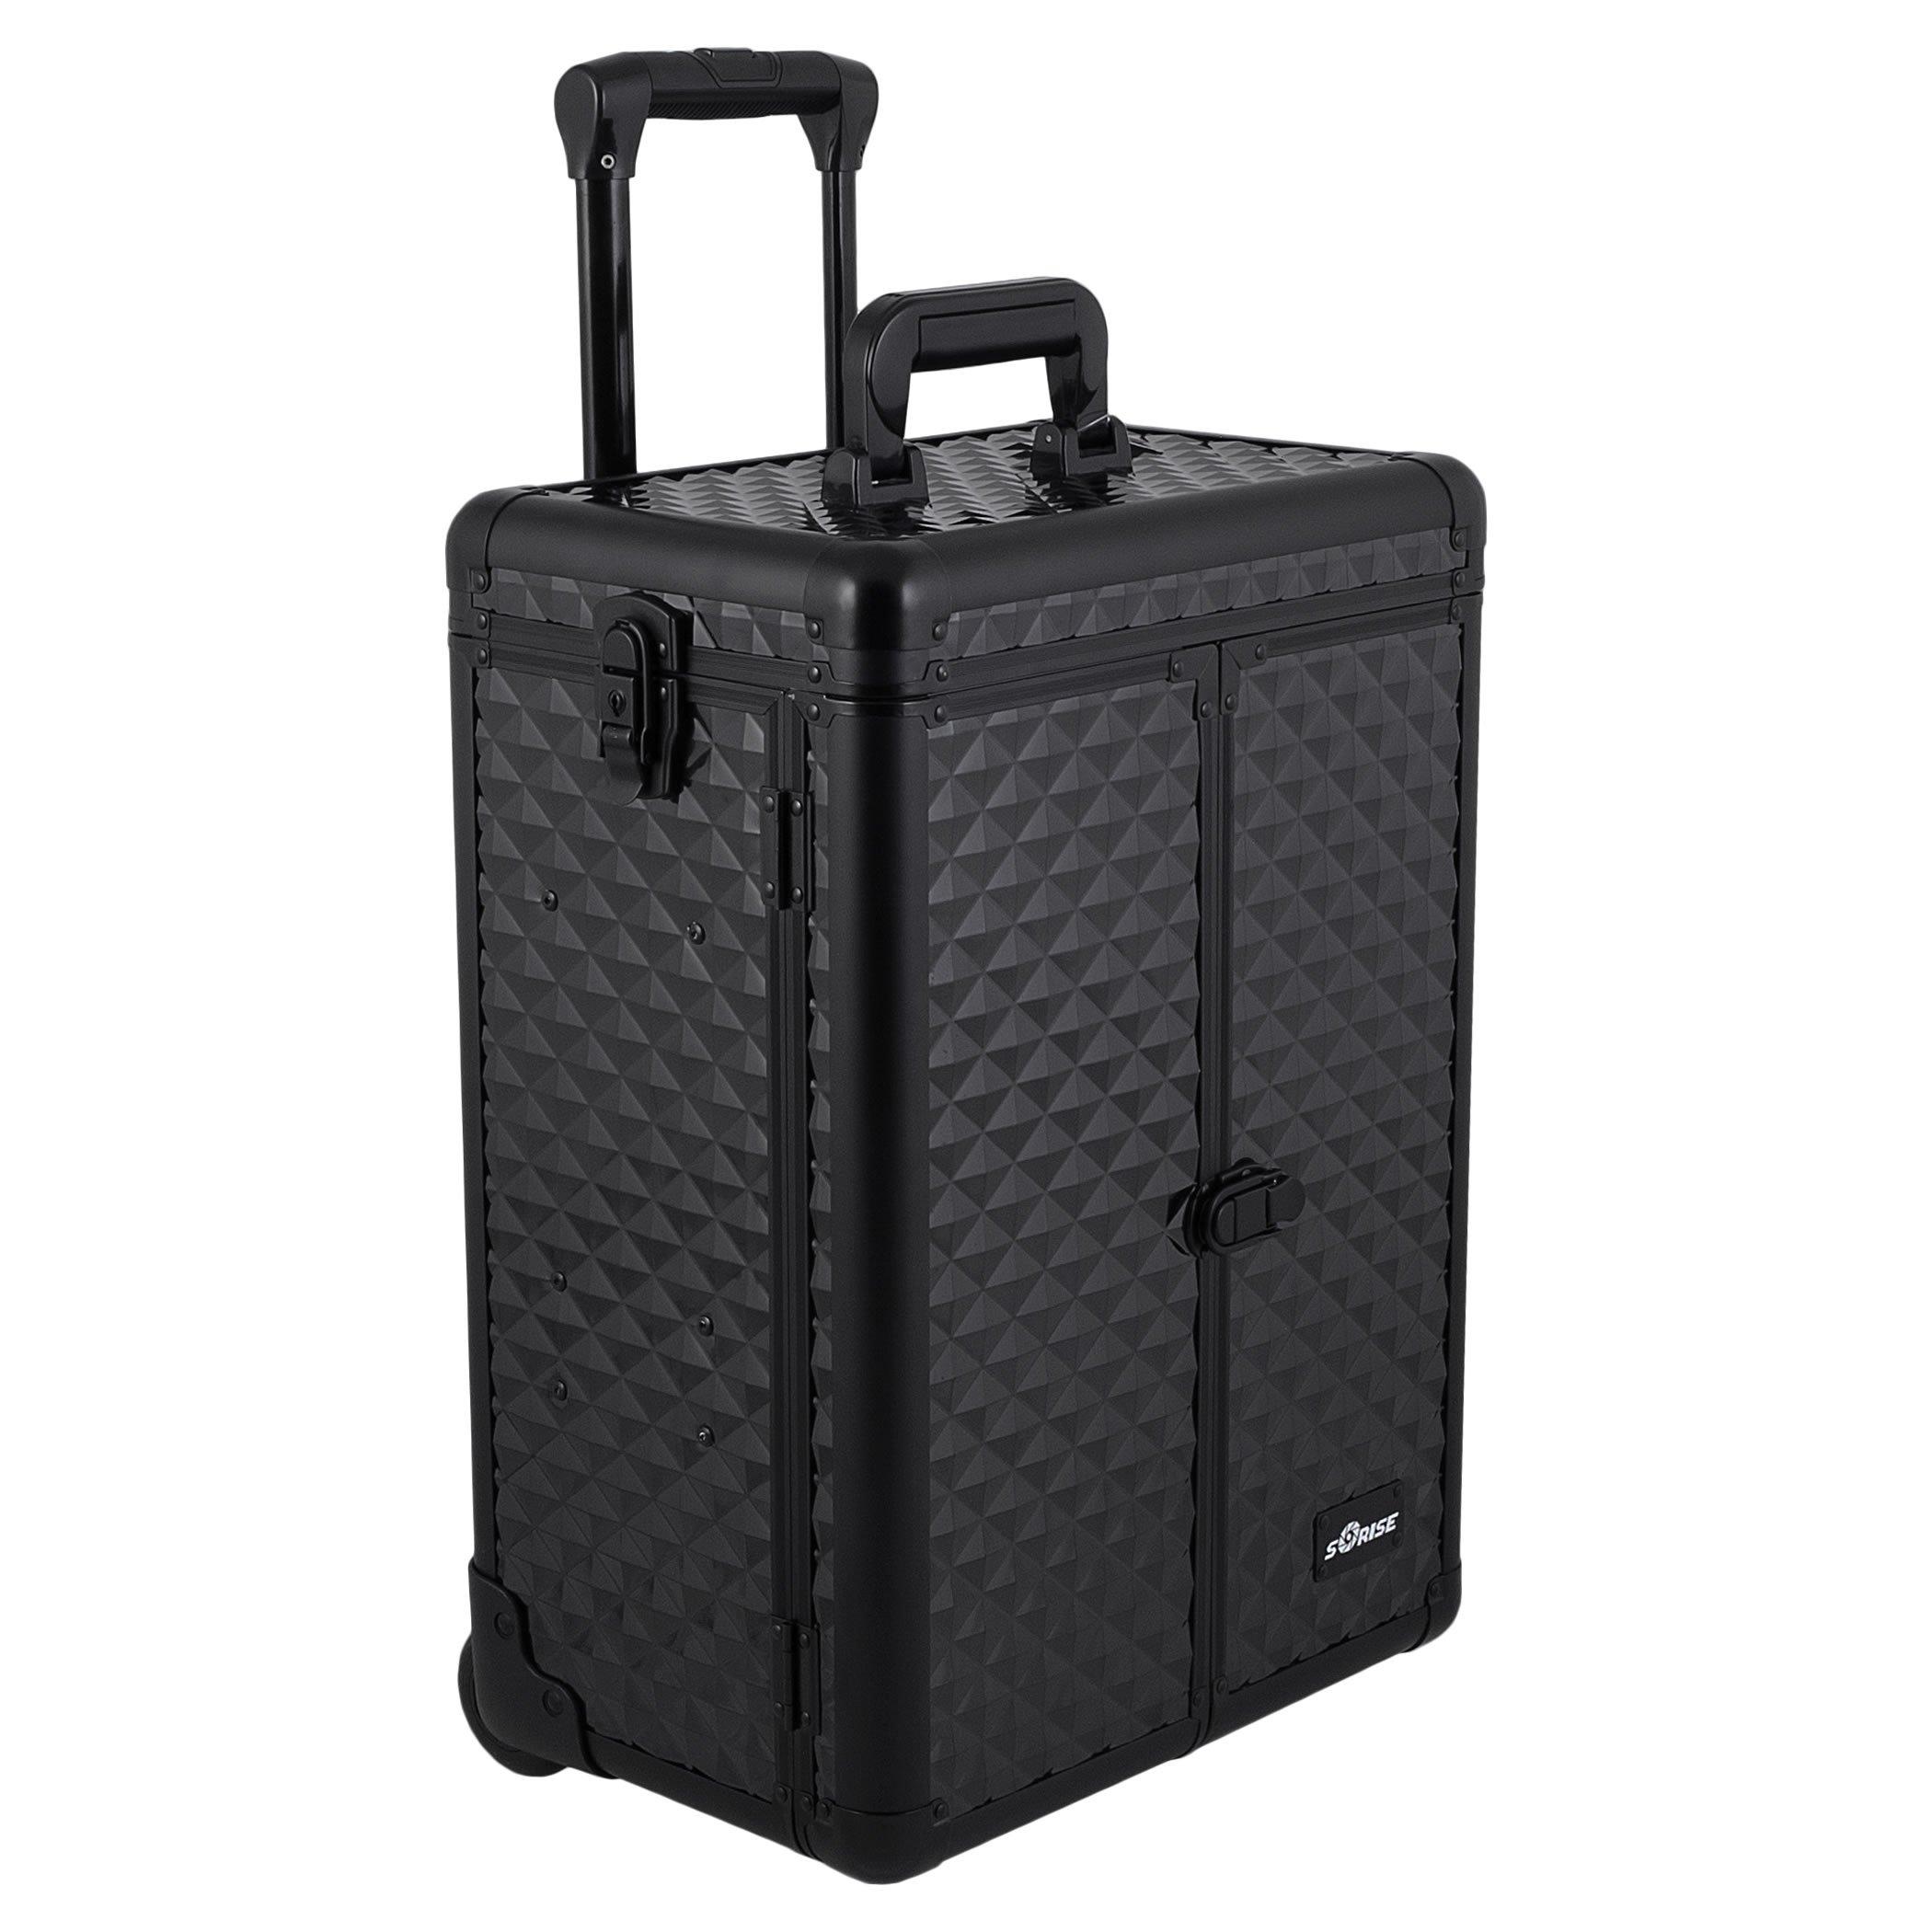 Sunrise La Latte Heavy Duty Rolling Makeup Case Professional Nail Travel Organizer Box, Black Diamond, 16 Pound